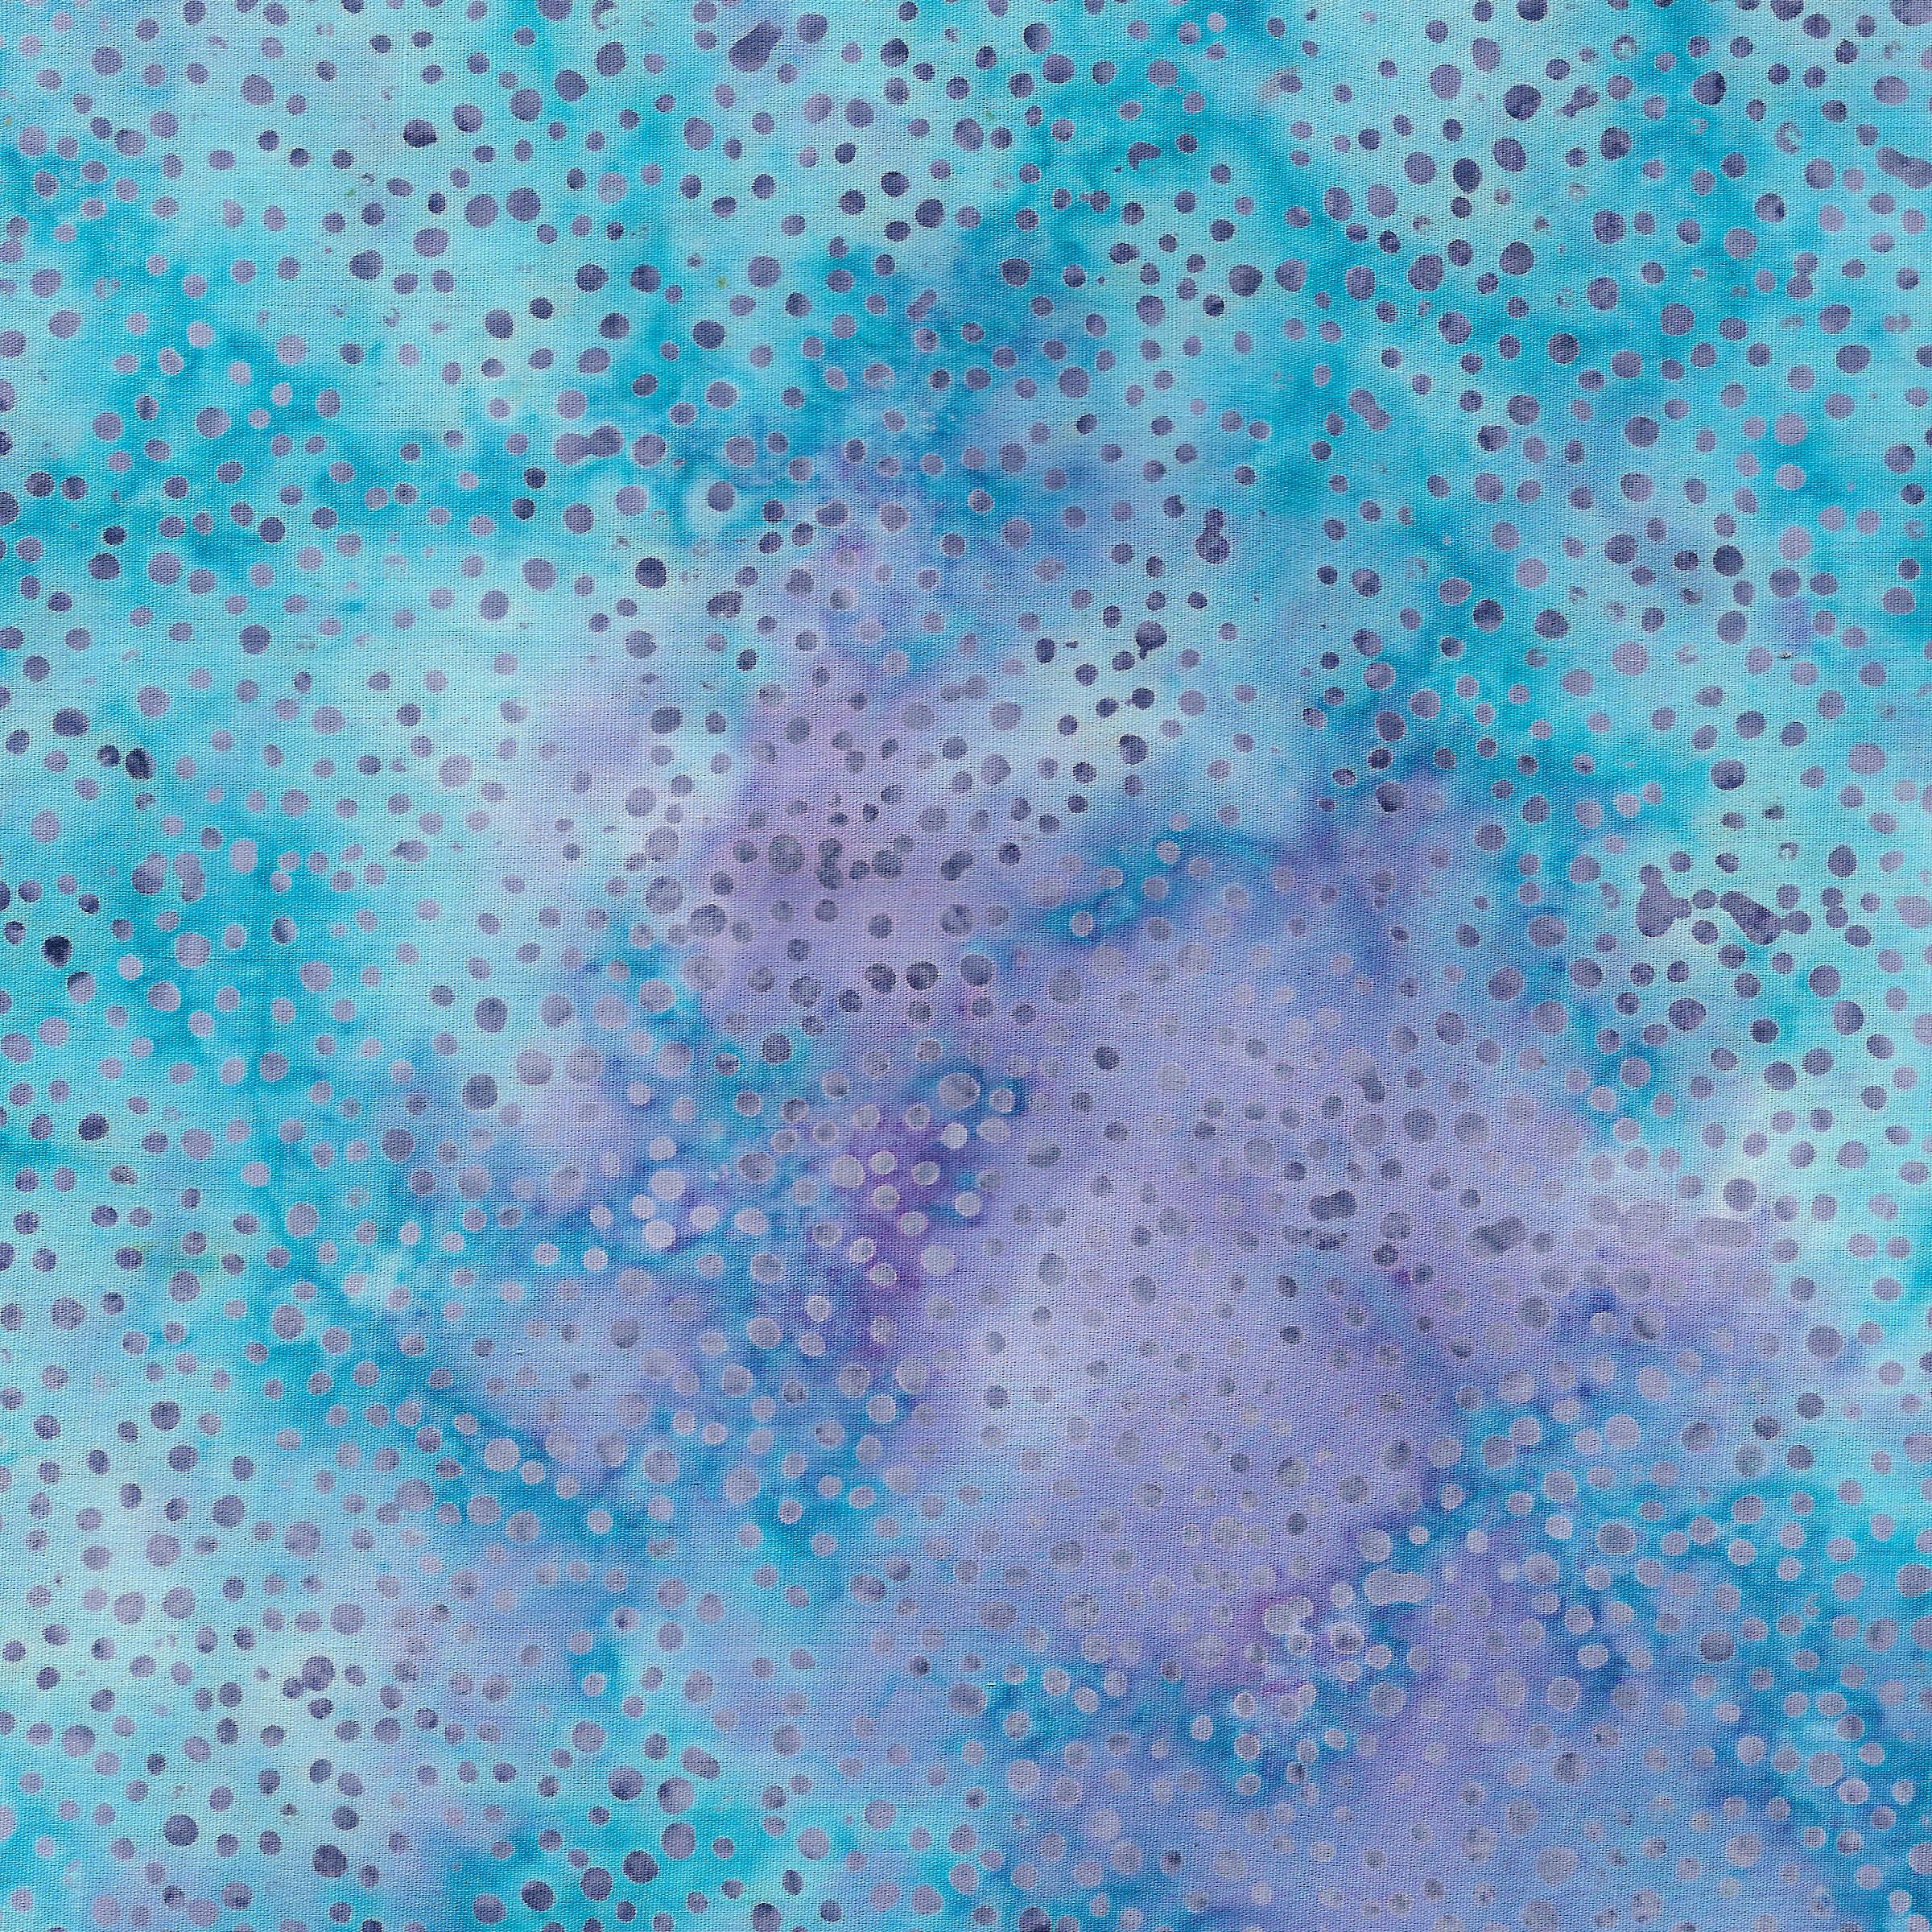 Blue Sea Frozen Pong Dot 111911531